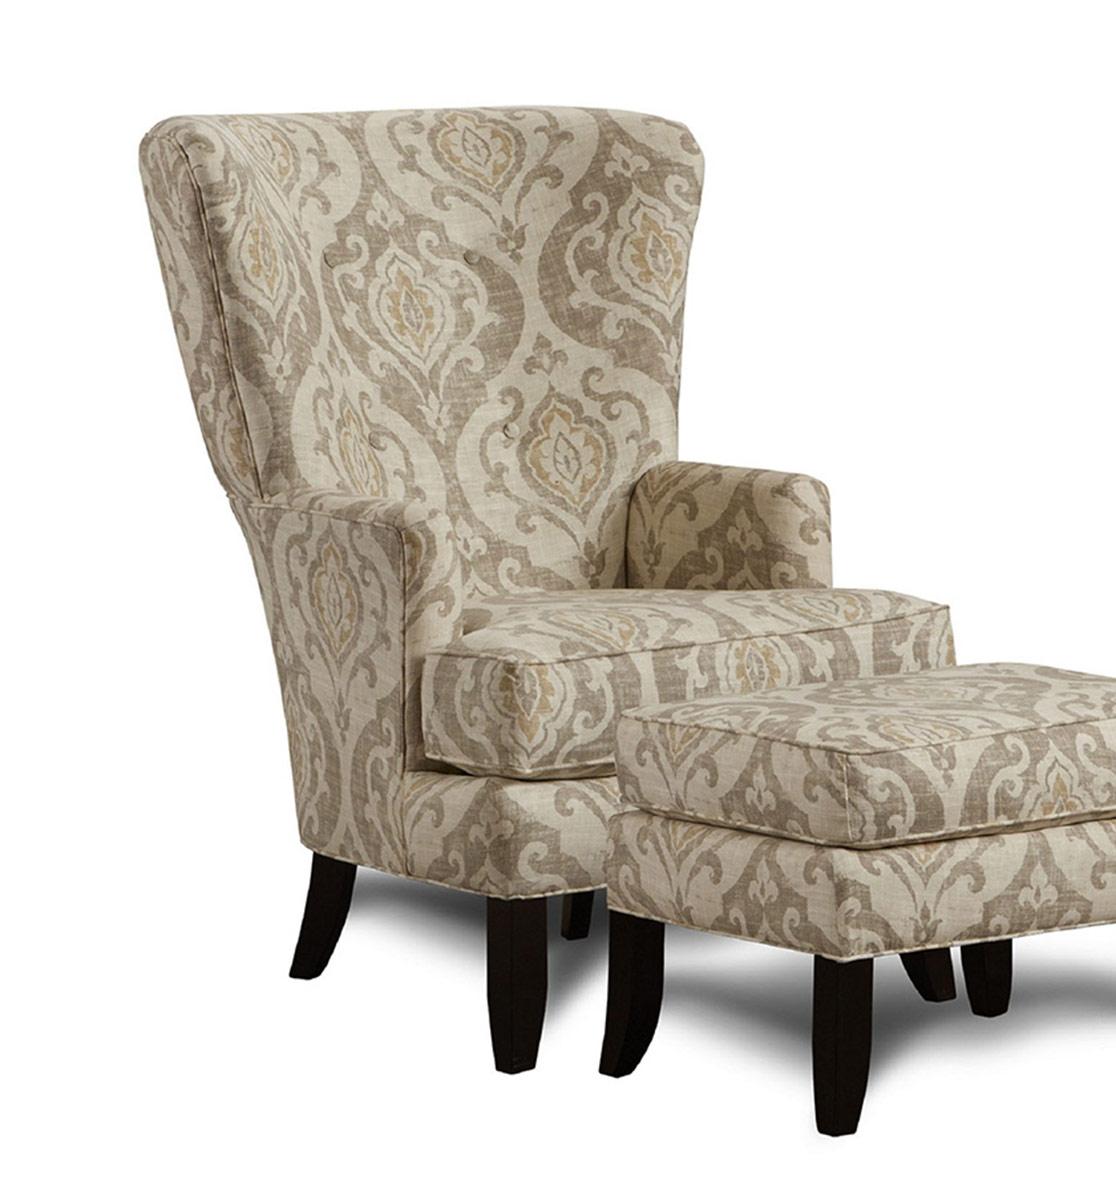 Chelsea Home Davin Accent Chair - Multicolor